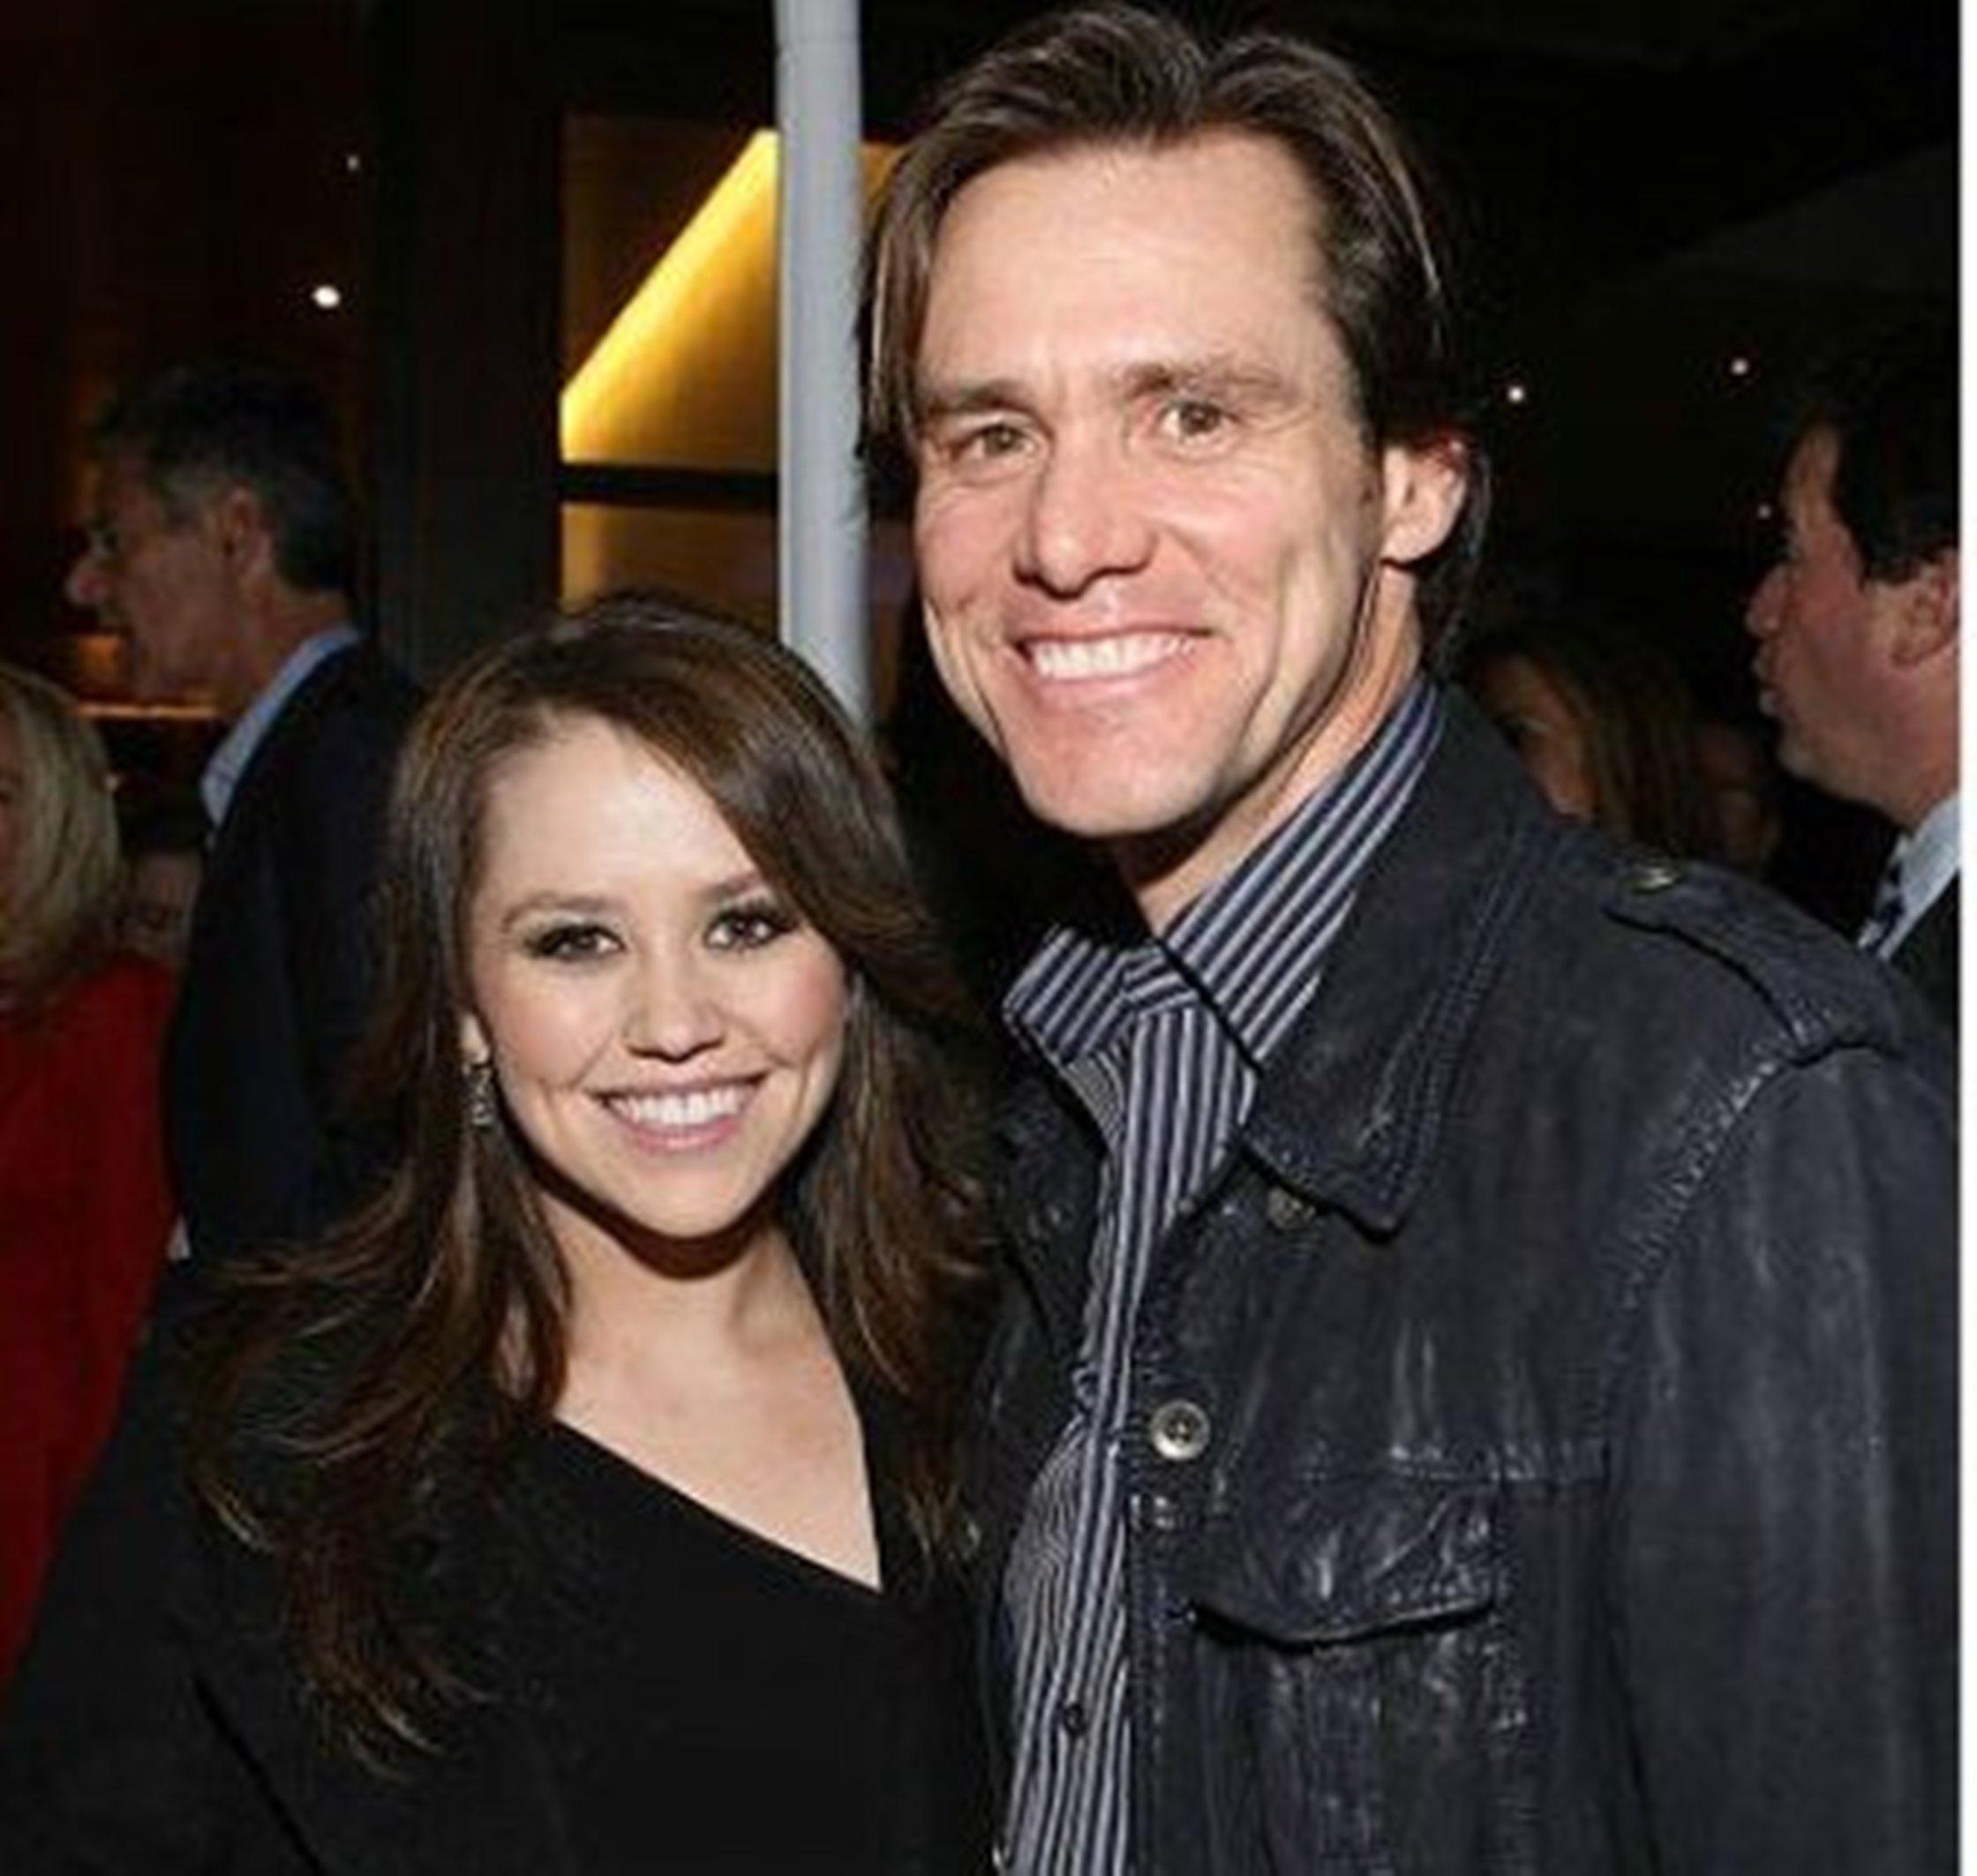 Jim Carrey's girlfriend Spouse Melissa Womer